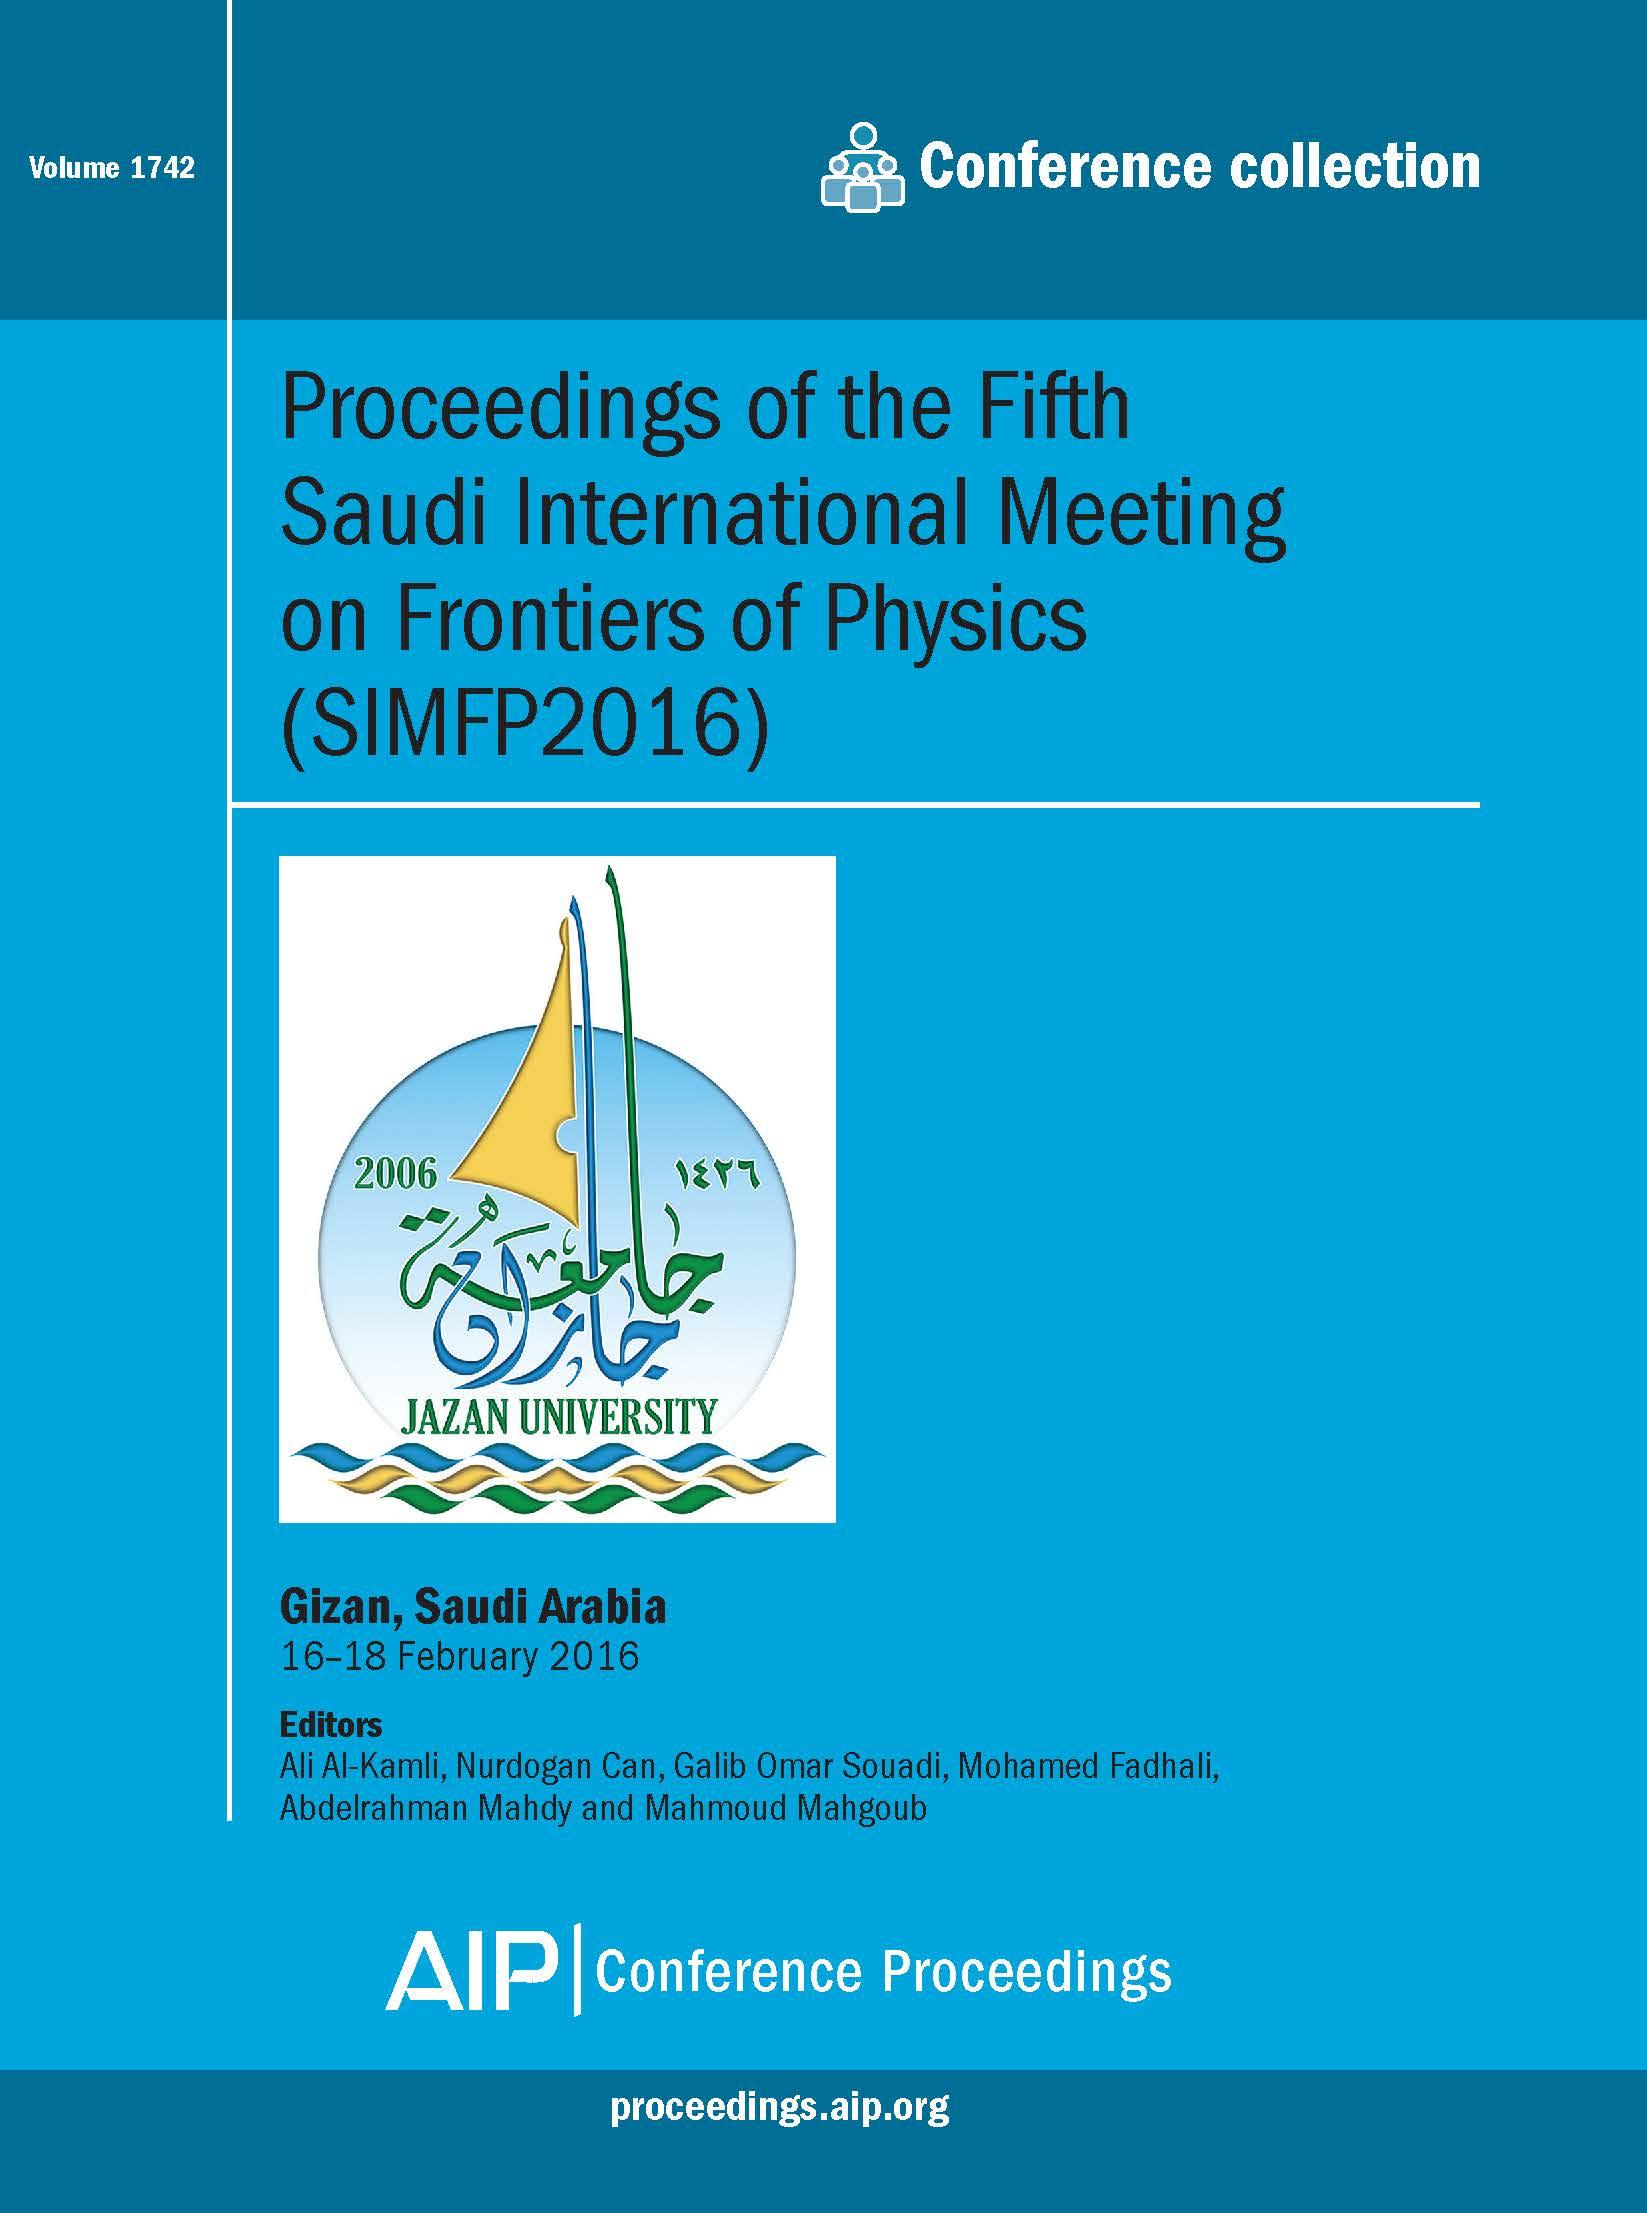 Volume 1742: Proceedings of the Fifth Saudi International Meeting on